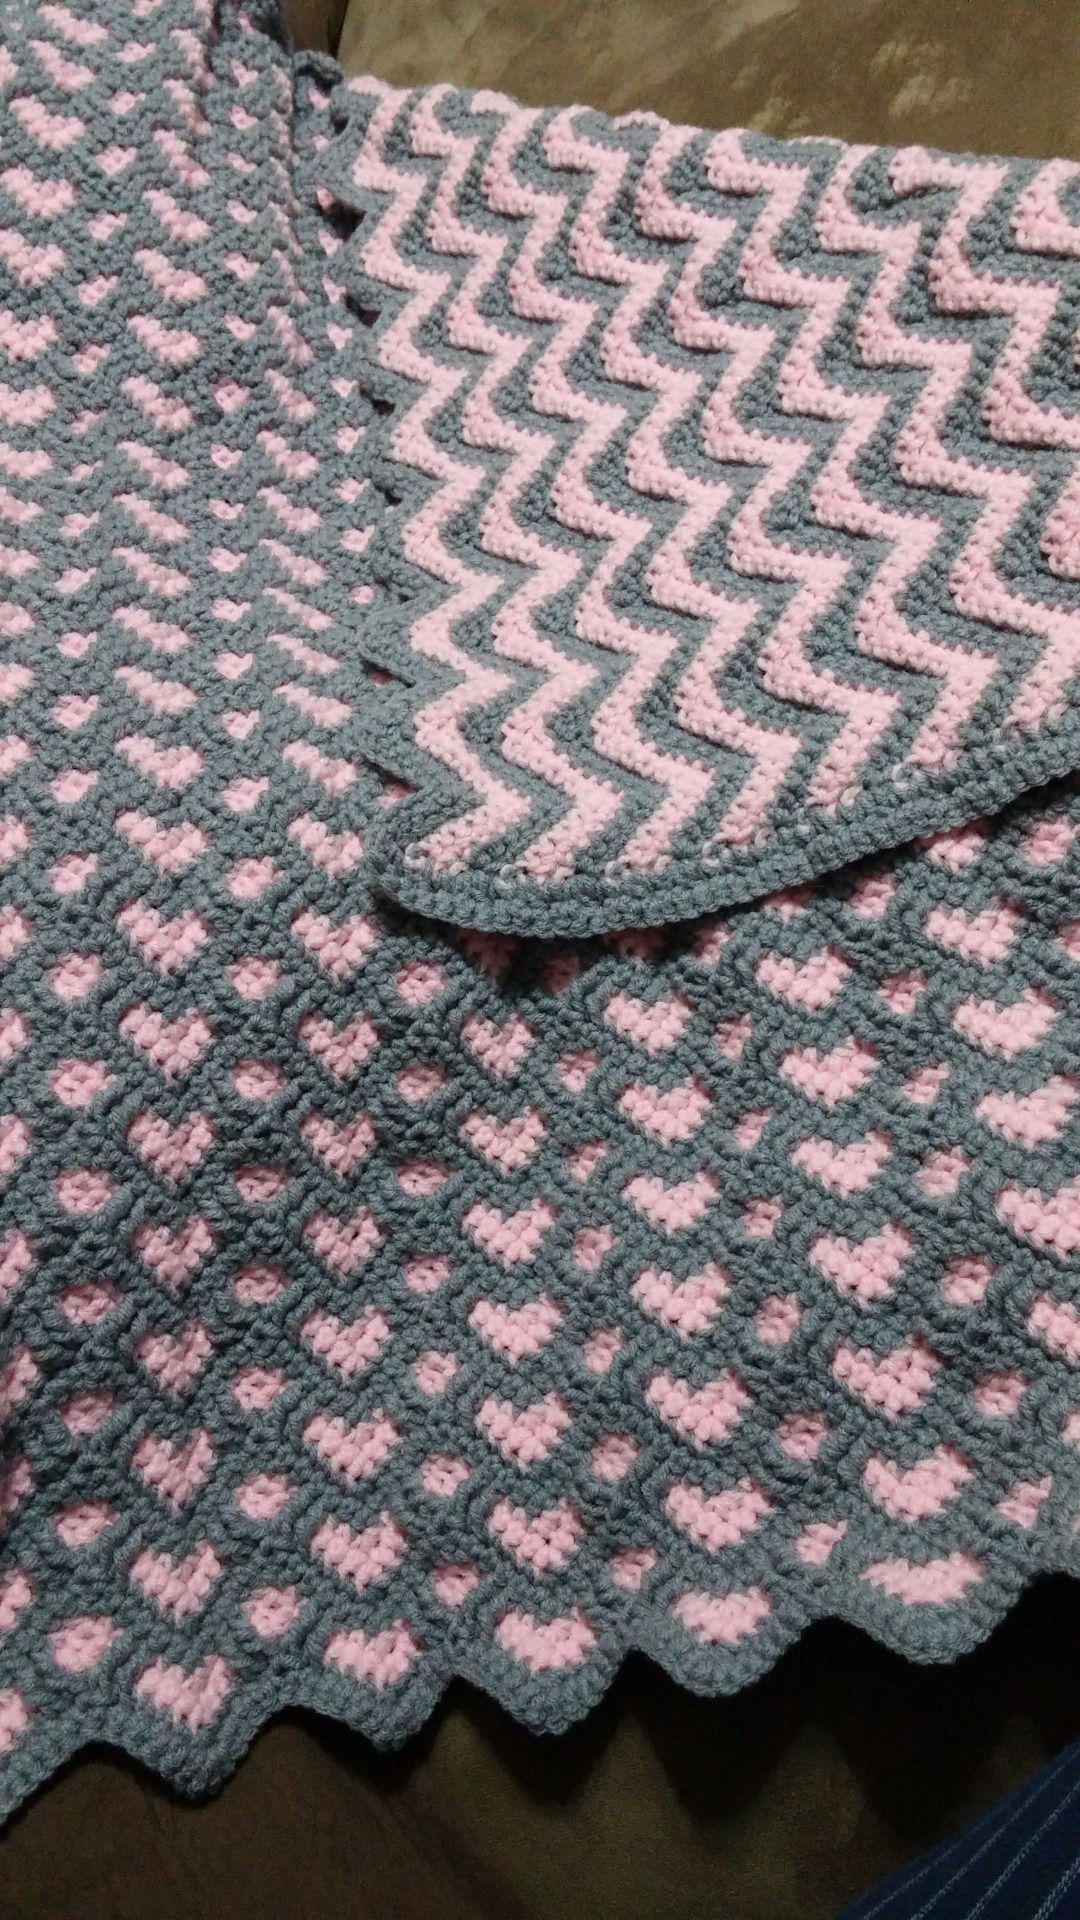 Sweetheart ripple httpravelrypatternslibrary sweetheart ripple httpravelrypatternslibrary free crochet afghan bankloansurffo Choice Image